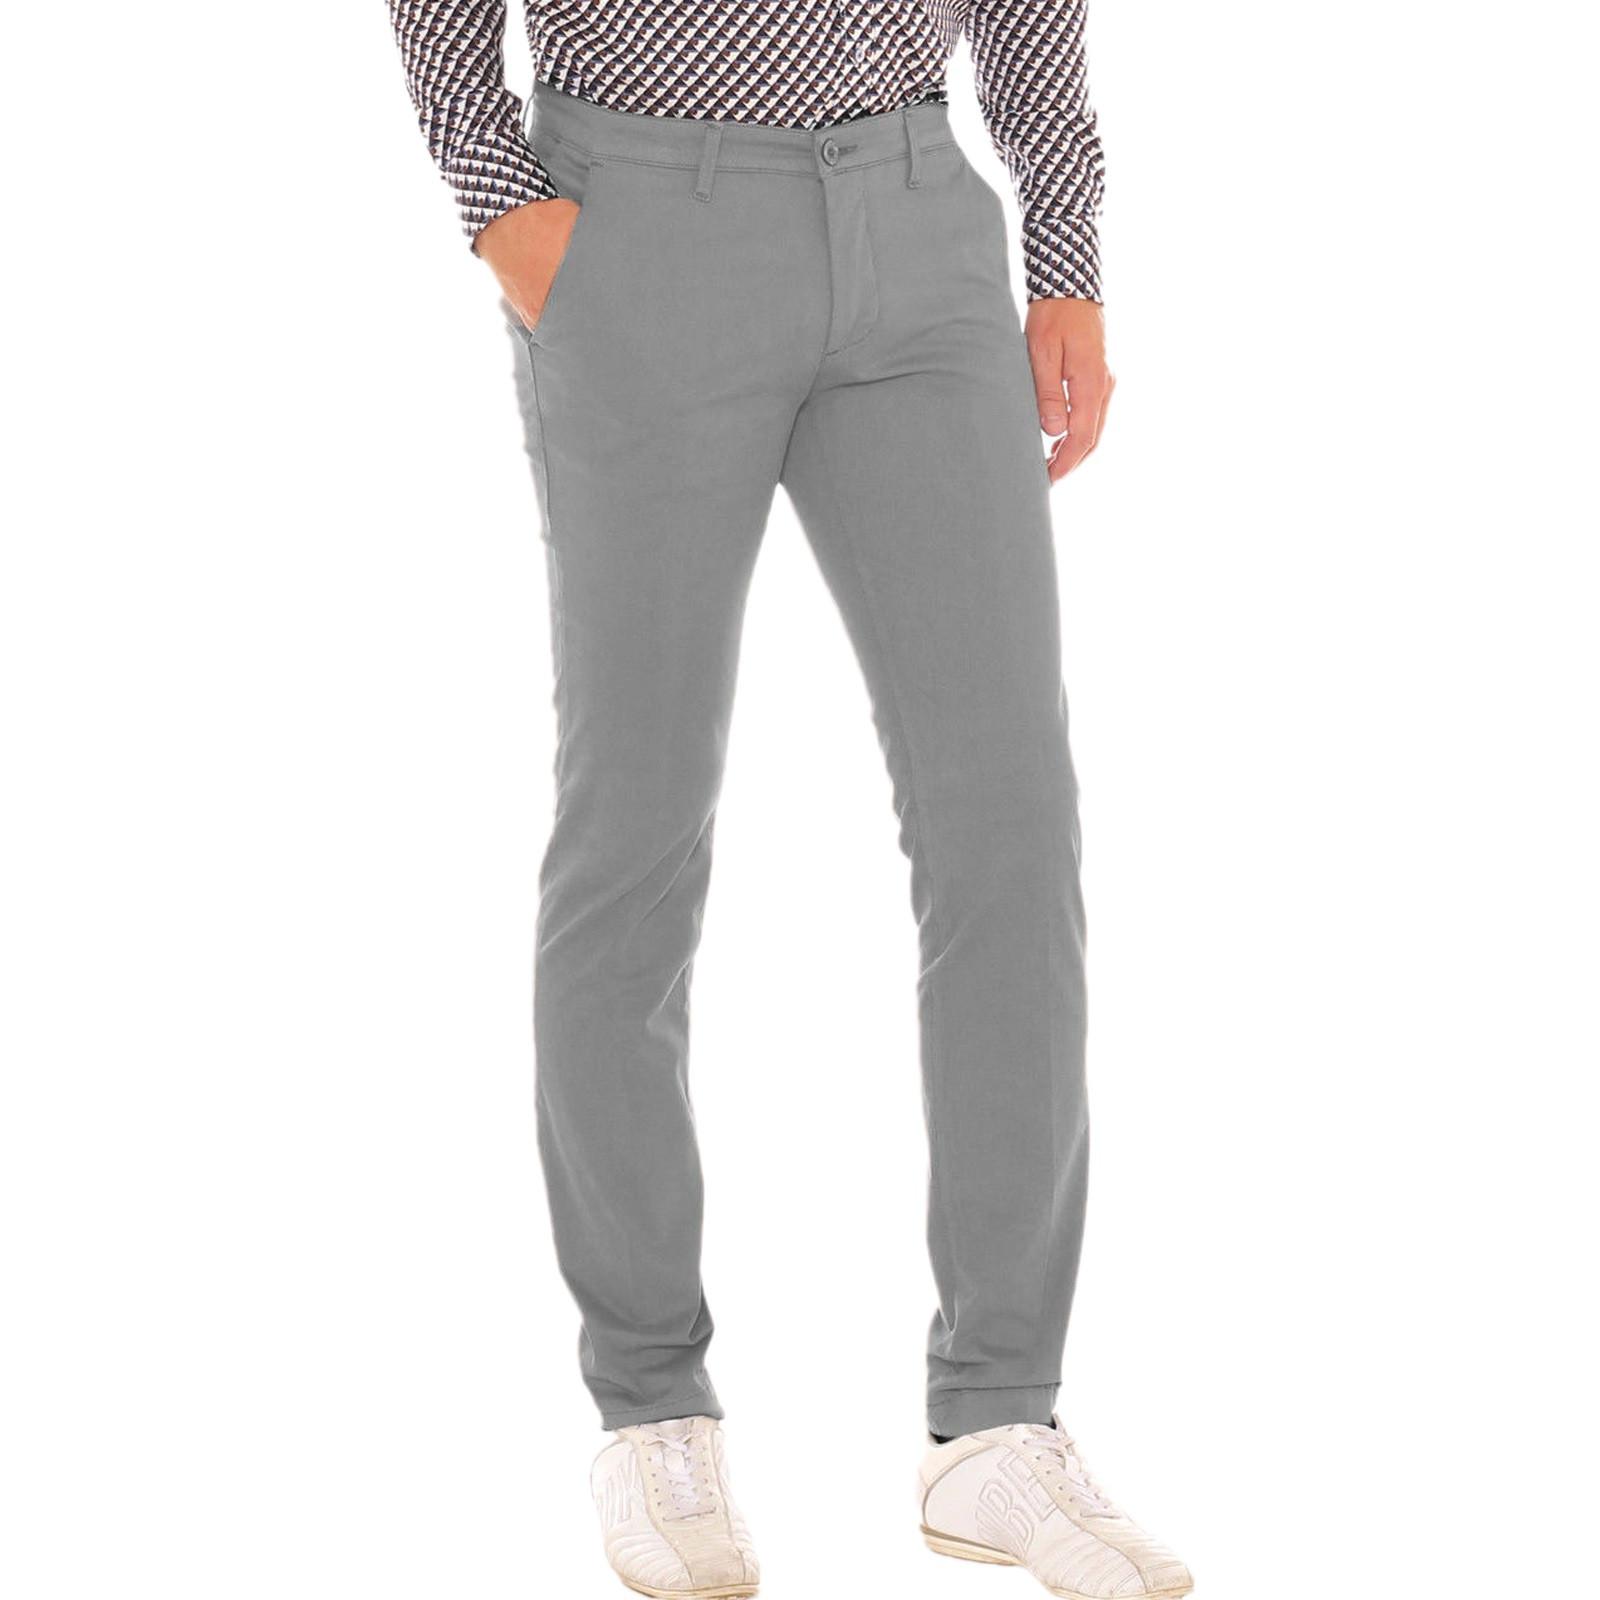 Pantalone-Uomo-Slim-fit-Chino-Elegante-Invernale-America-Cotone-Tasca-america miniatura 33